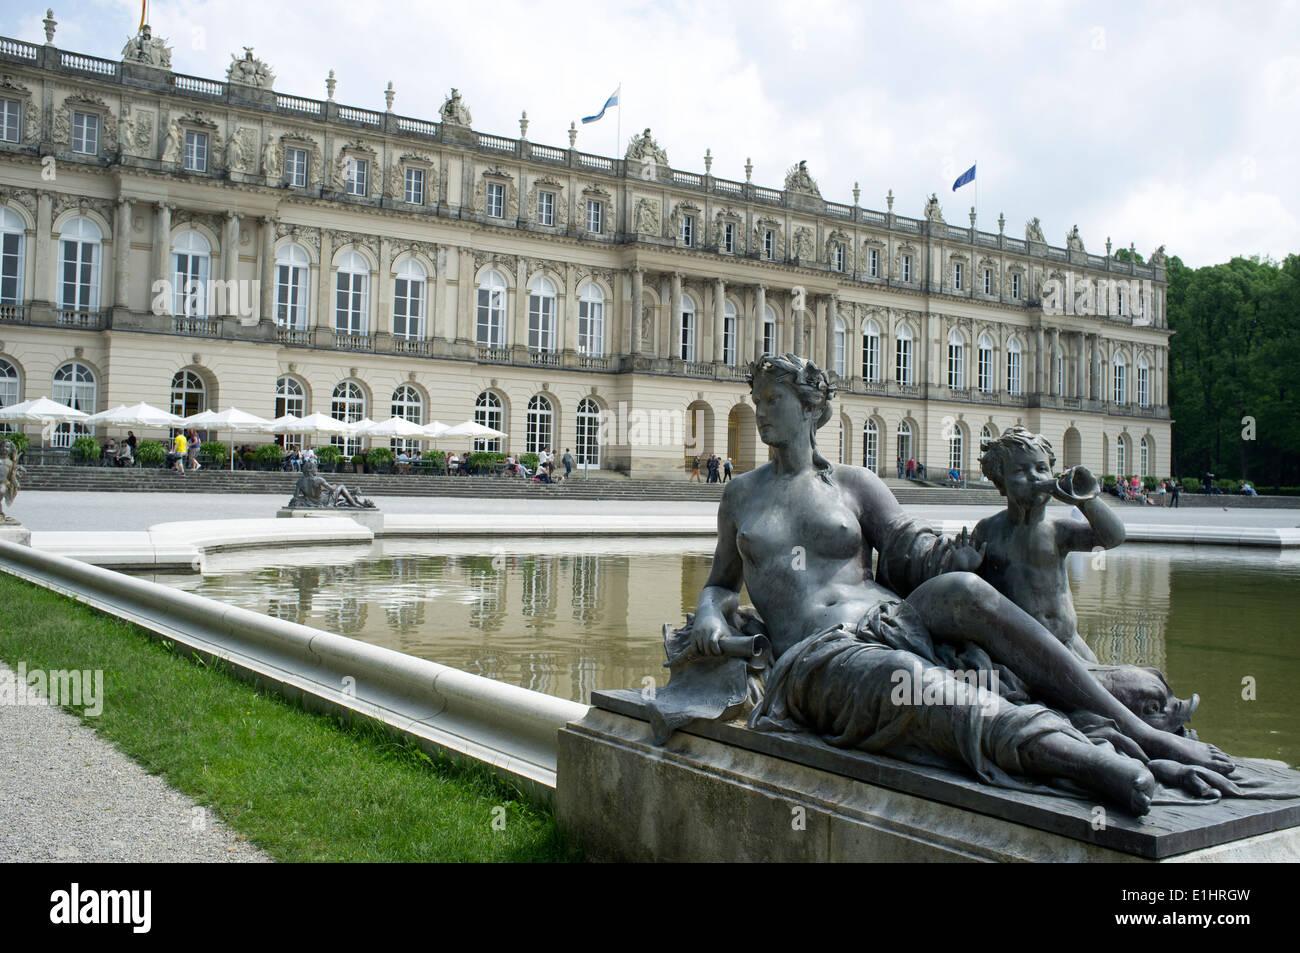 Herrenchiemsee royal palace, Herreninsel, Chiemsee, Bavaria, Germany. - Stock Image